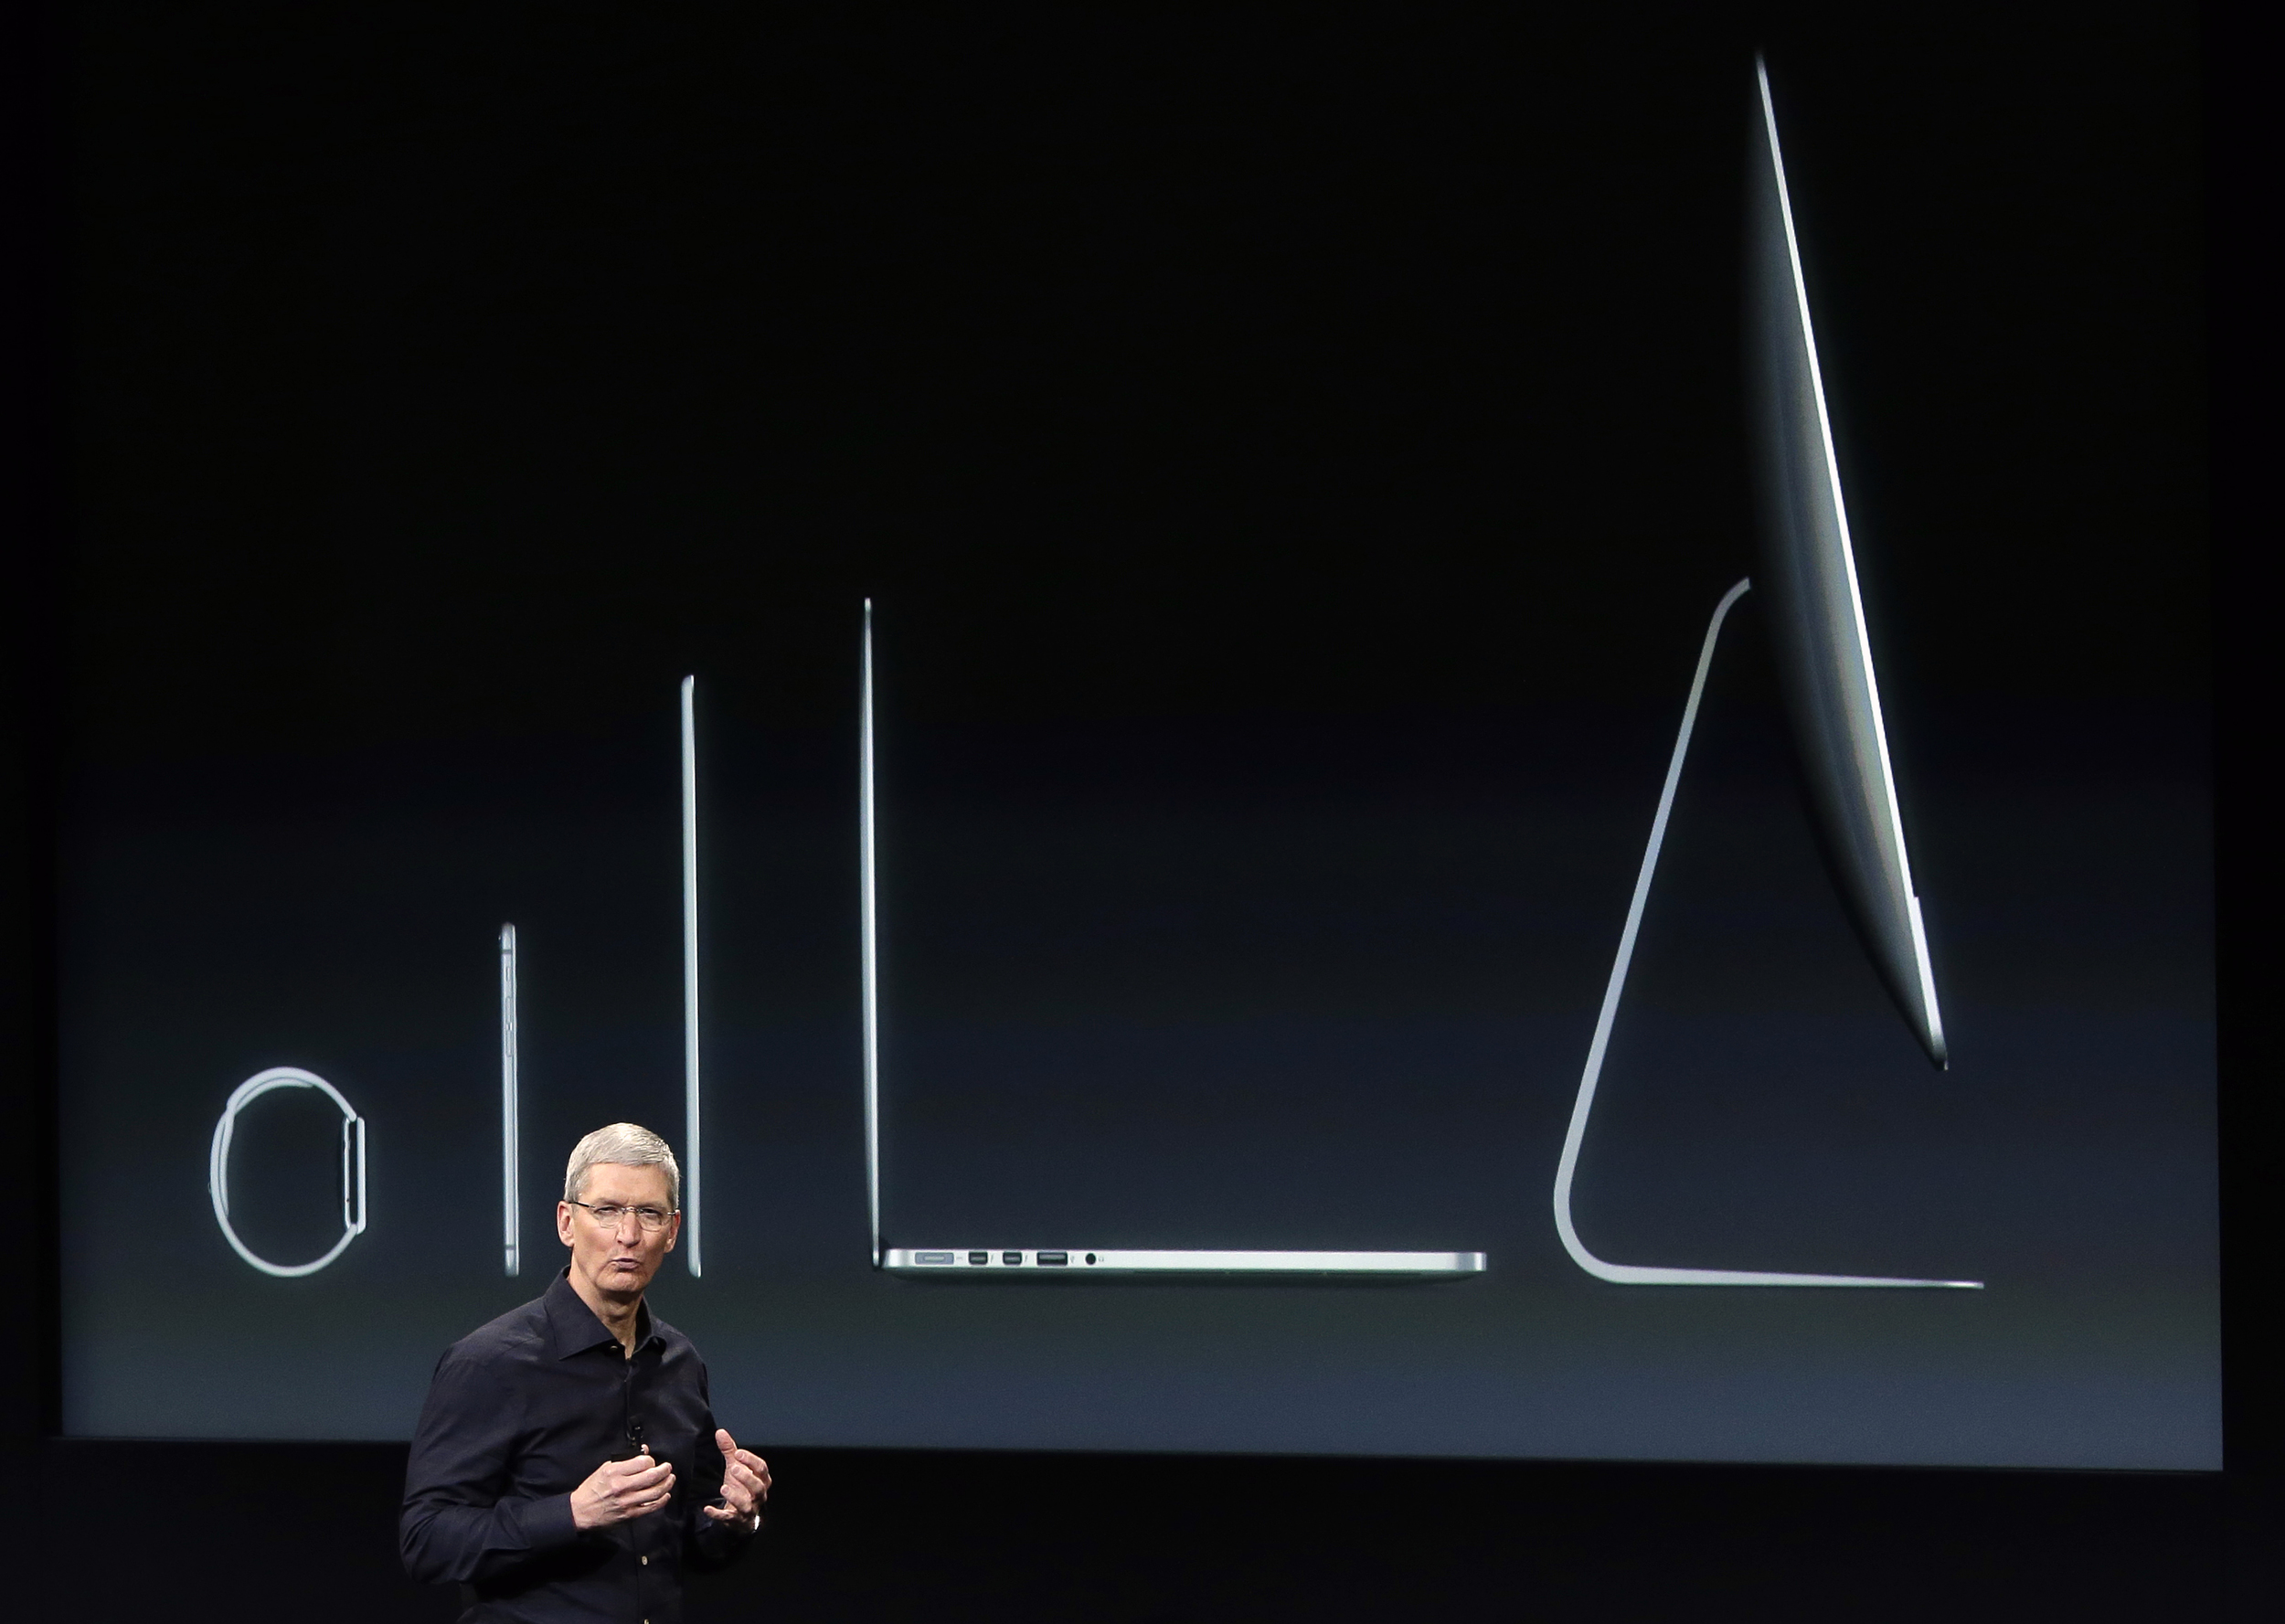 Apple's device line-up (Source: http://malvasiabianca.org )